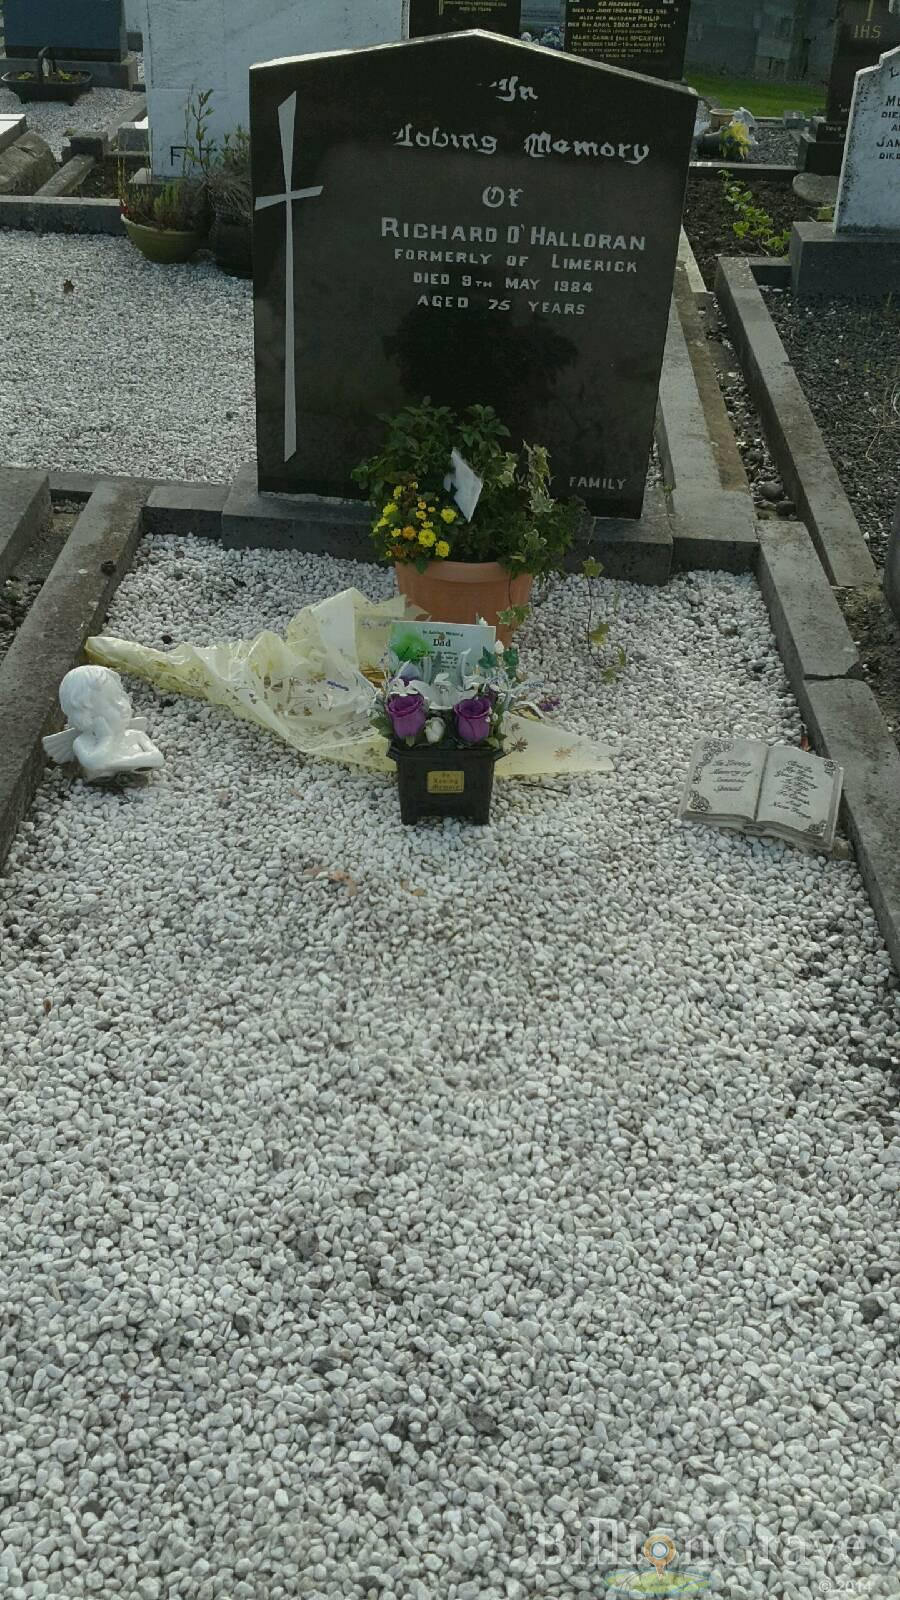 grave site of richard o halloran 1984 billiongraves headstone image of richard o halloran